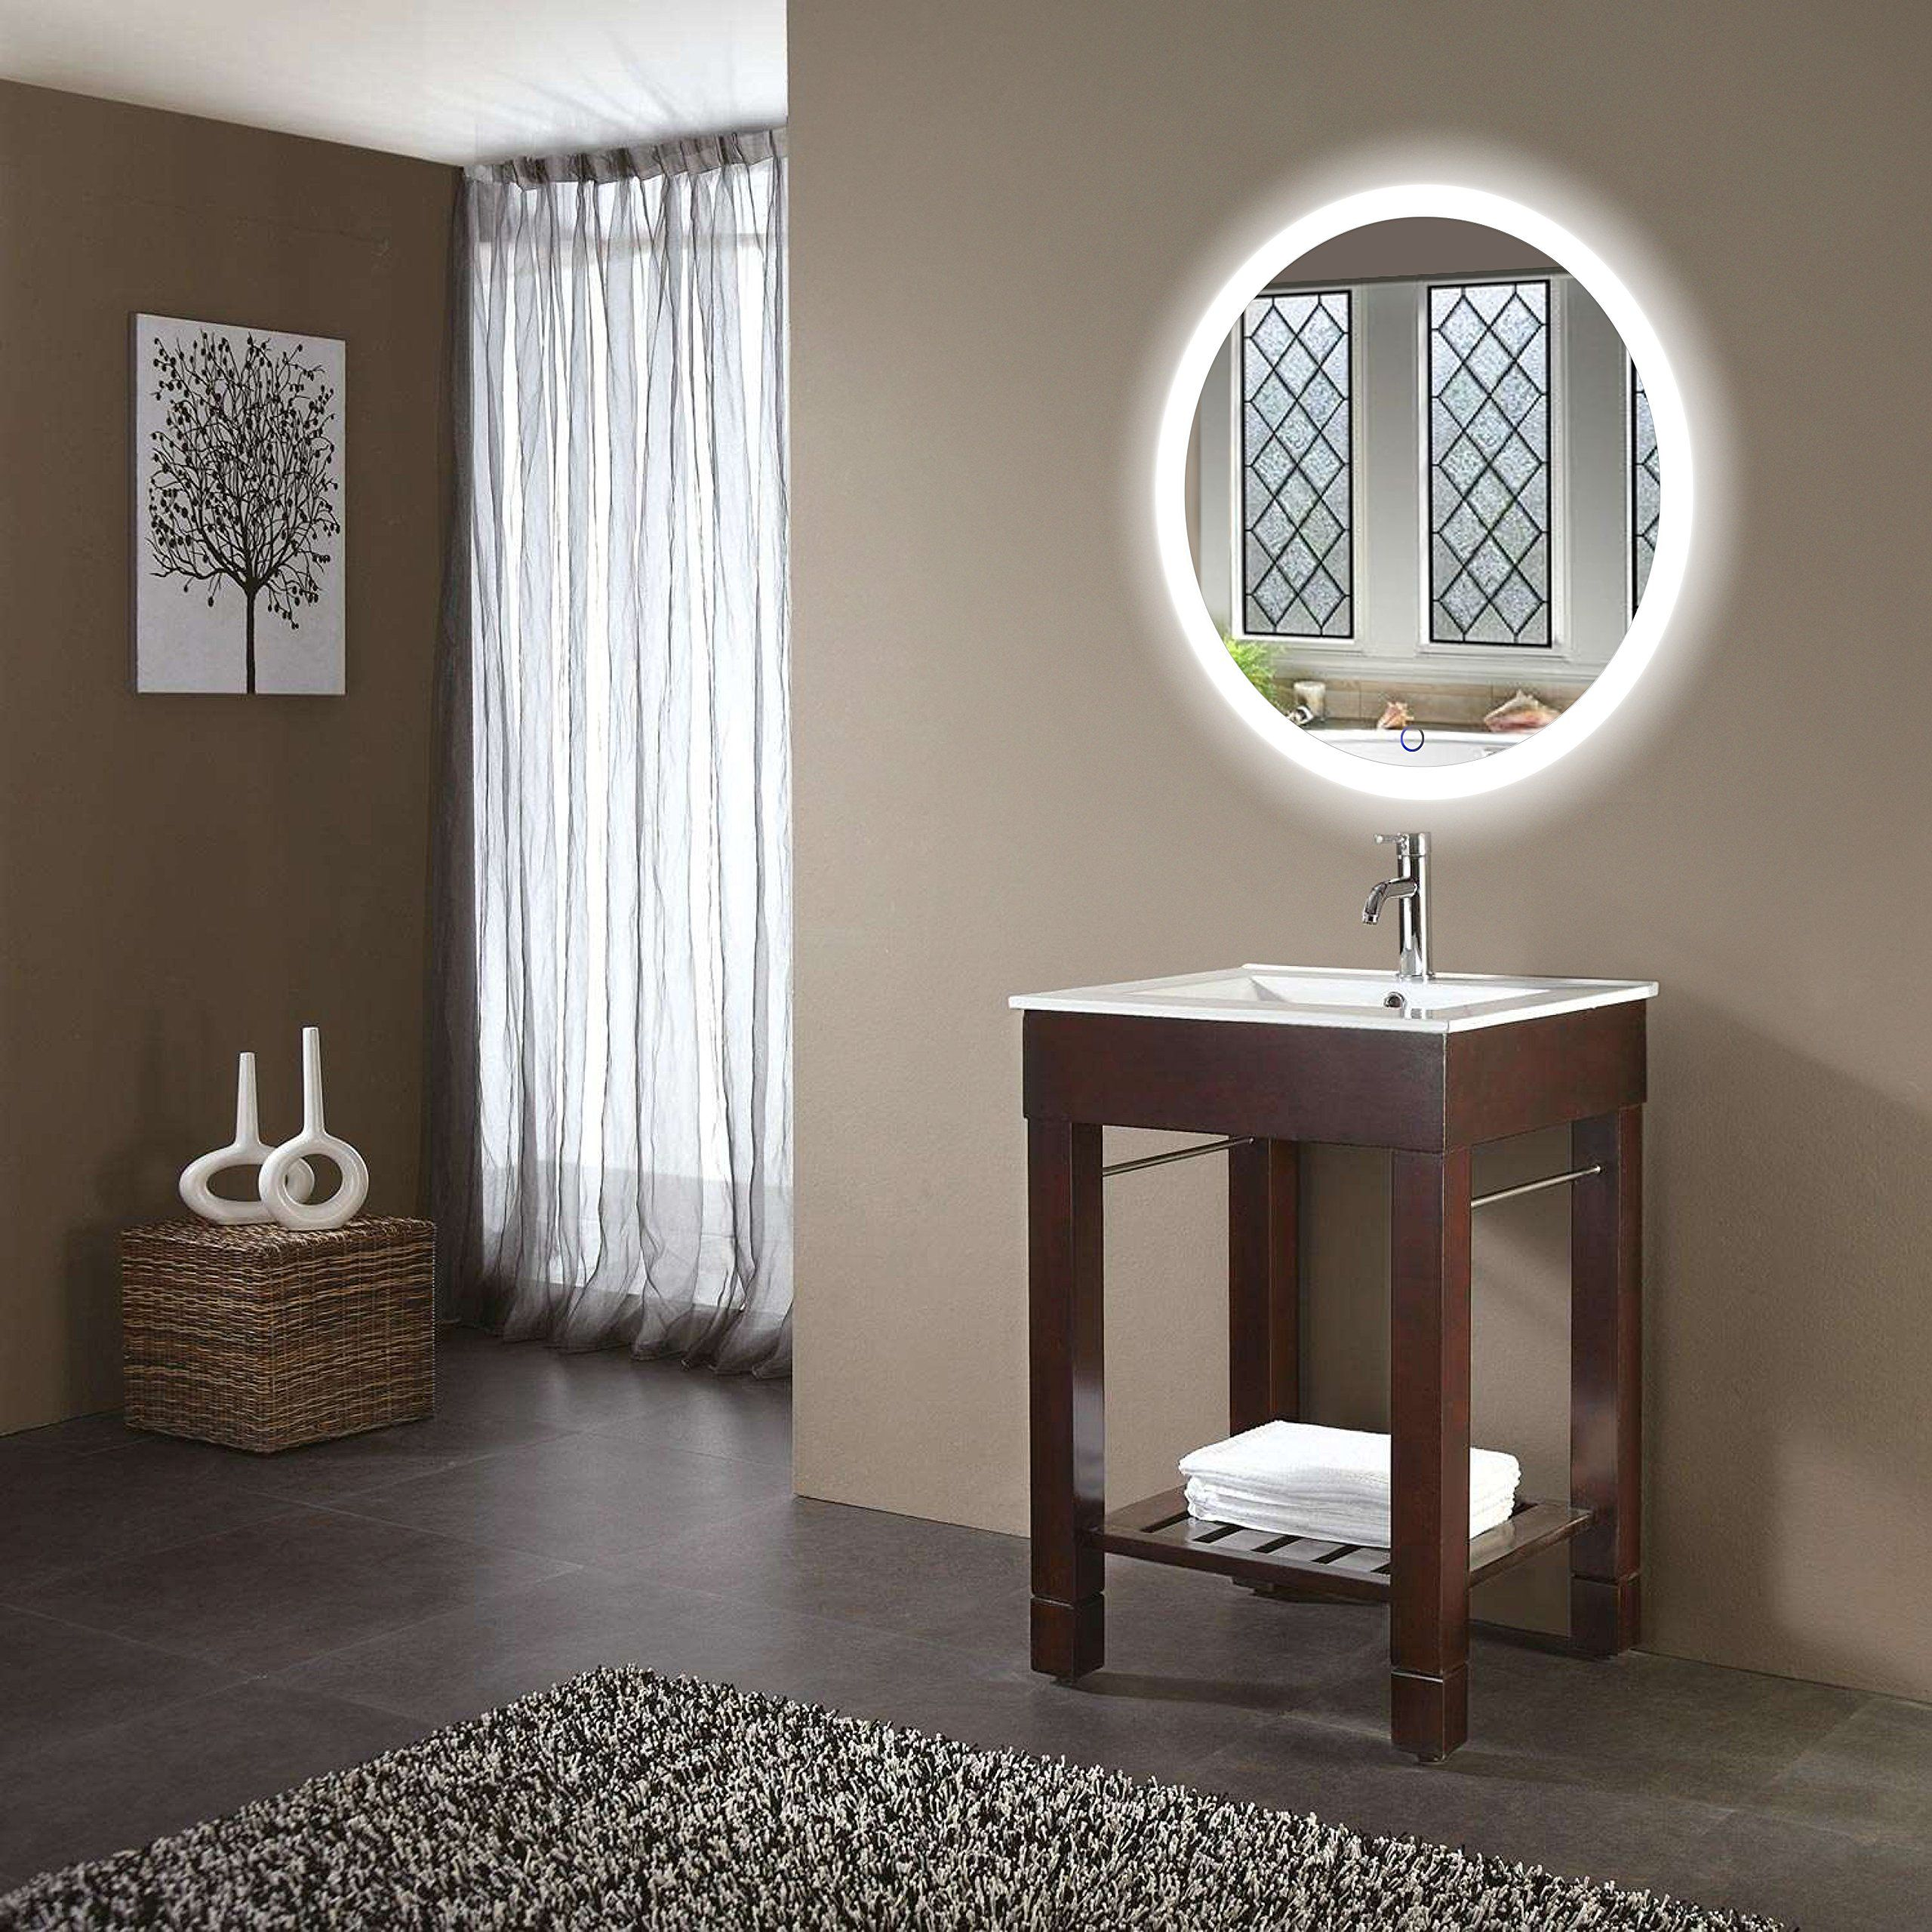 Led Bathroom Round Mirror 27 Inch Diameter Lighted Vanity Mirror